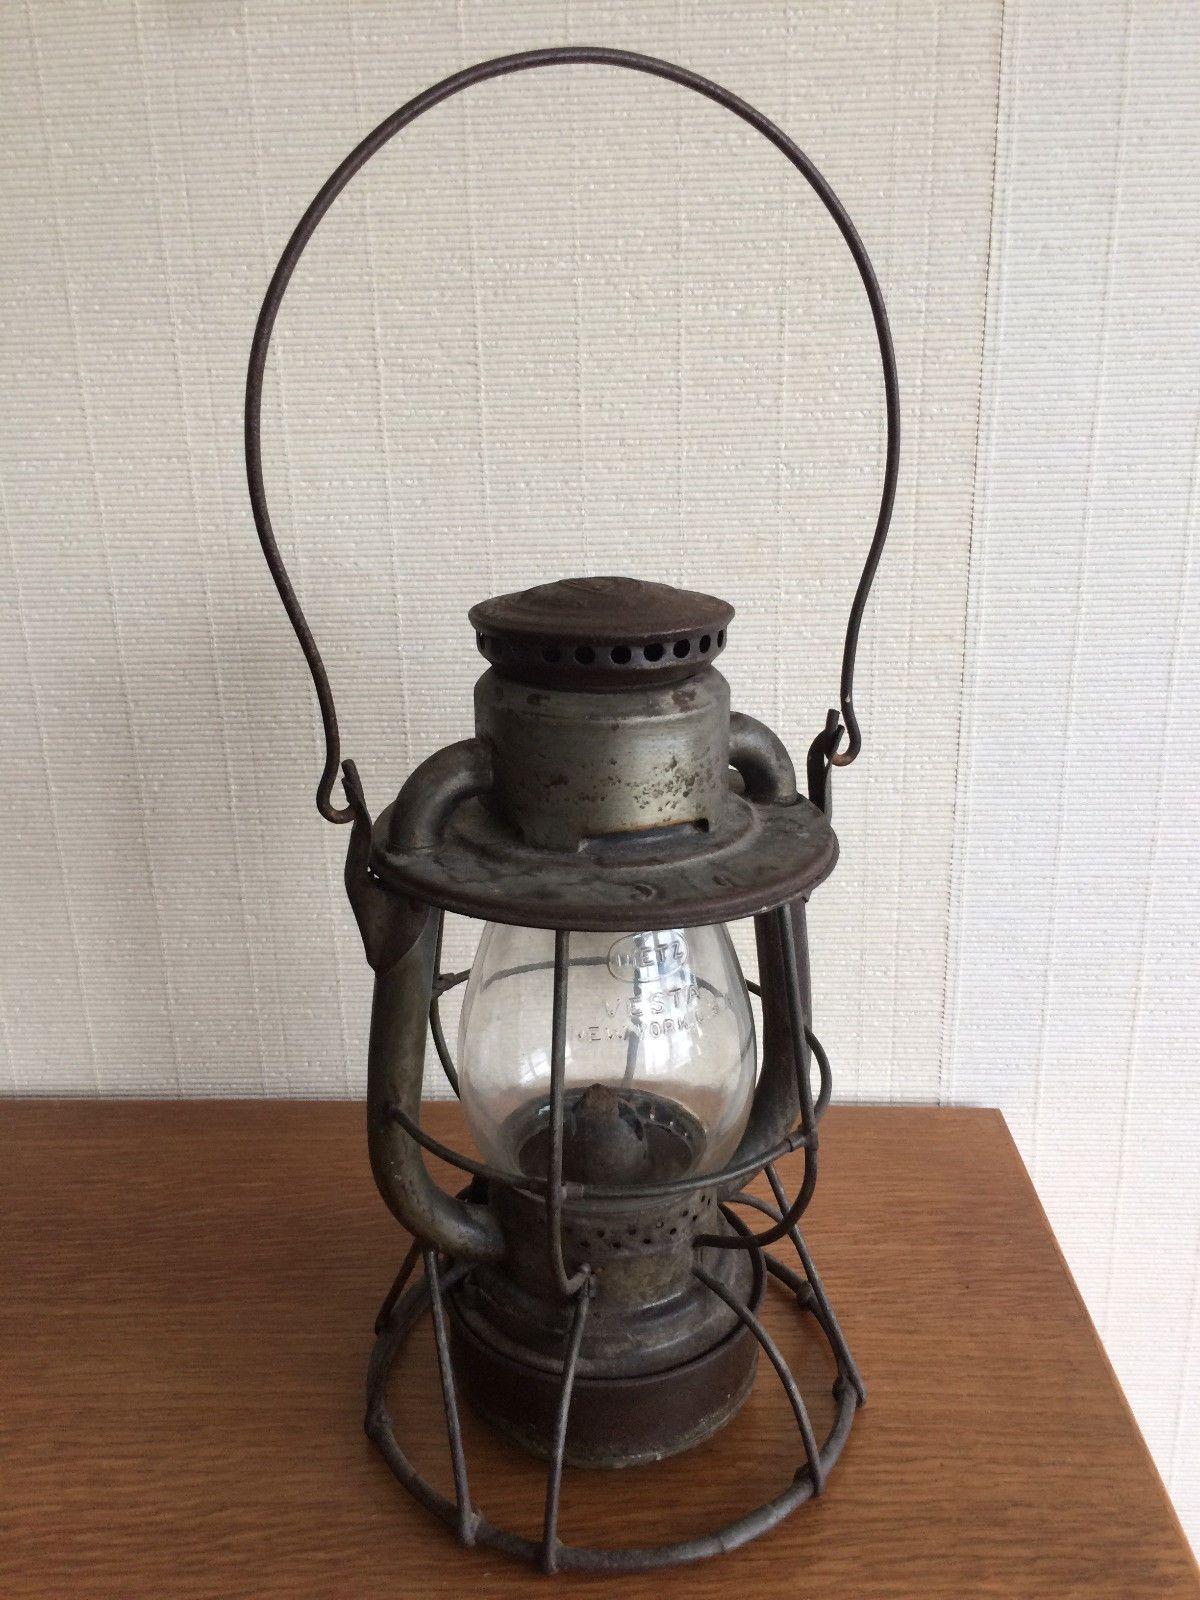 Vintage Dietz Vesta Railroad Lantern New York Usa Patented Lampe